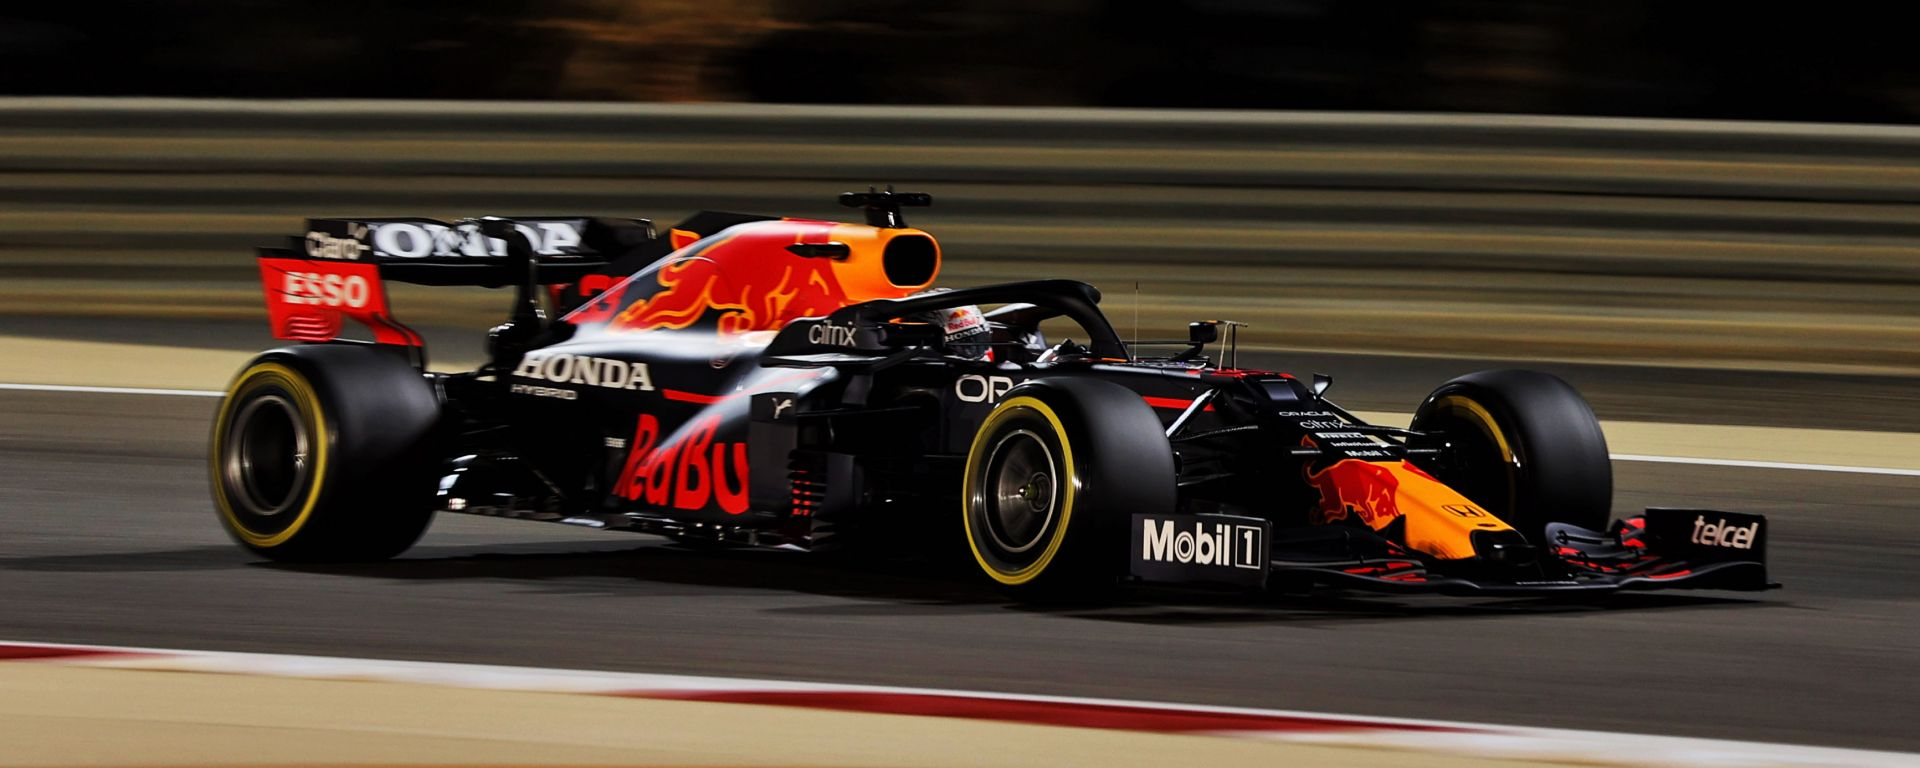 F1 GP Bahrain 2021, Sakhir: Max Verstappen (Red Bull Racing)